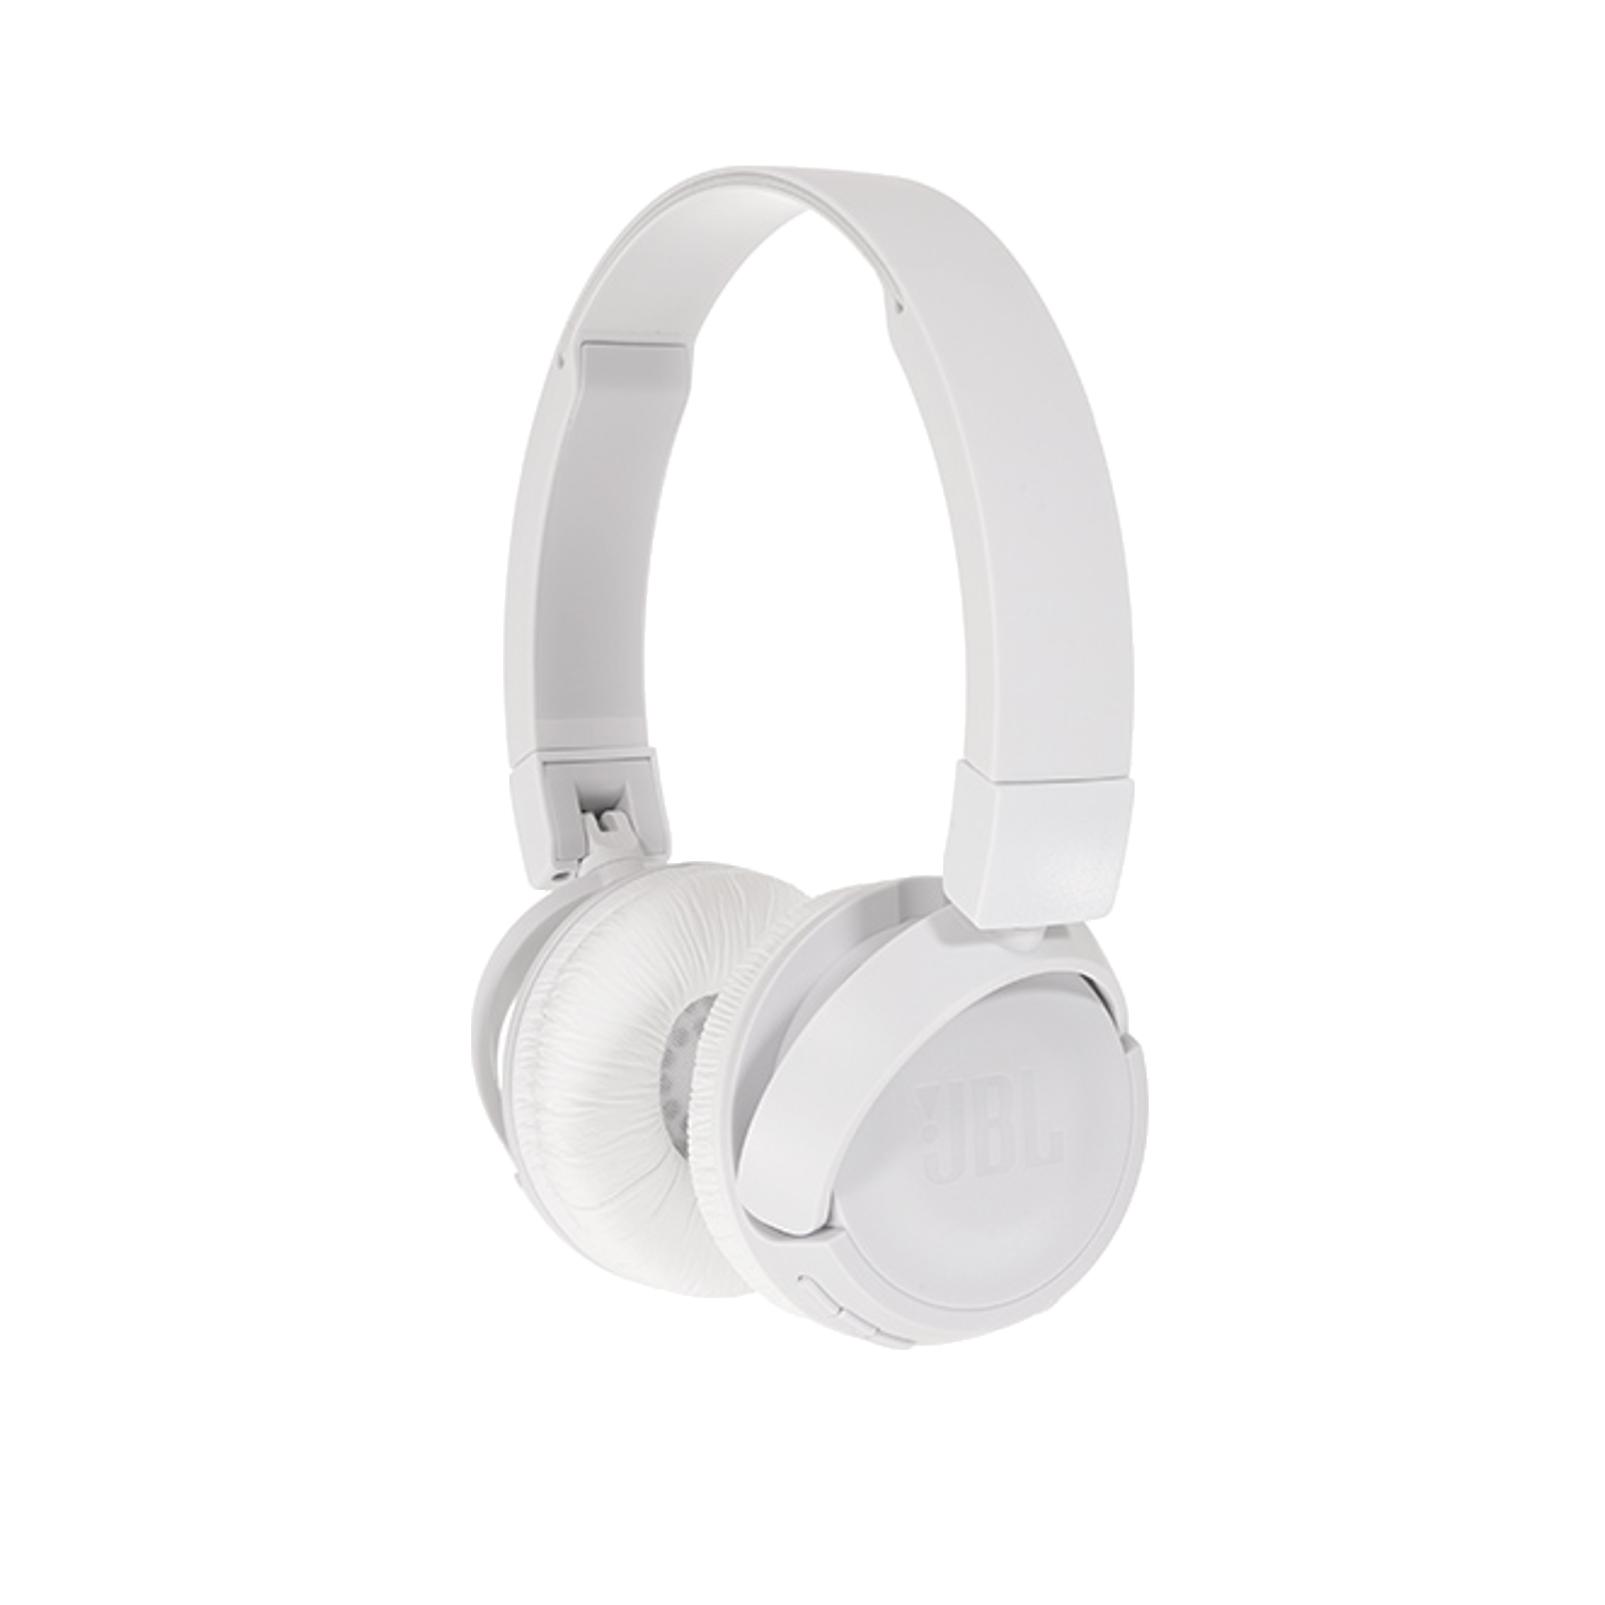 JBL T460BT - White - Wireless on-ear headphones - Hero